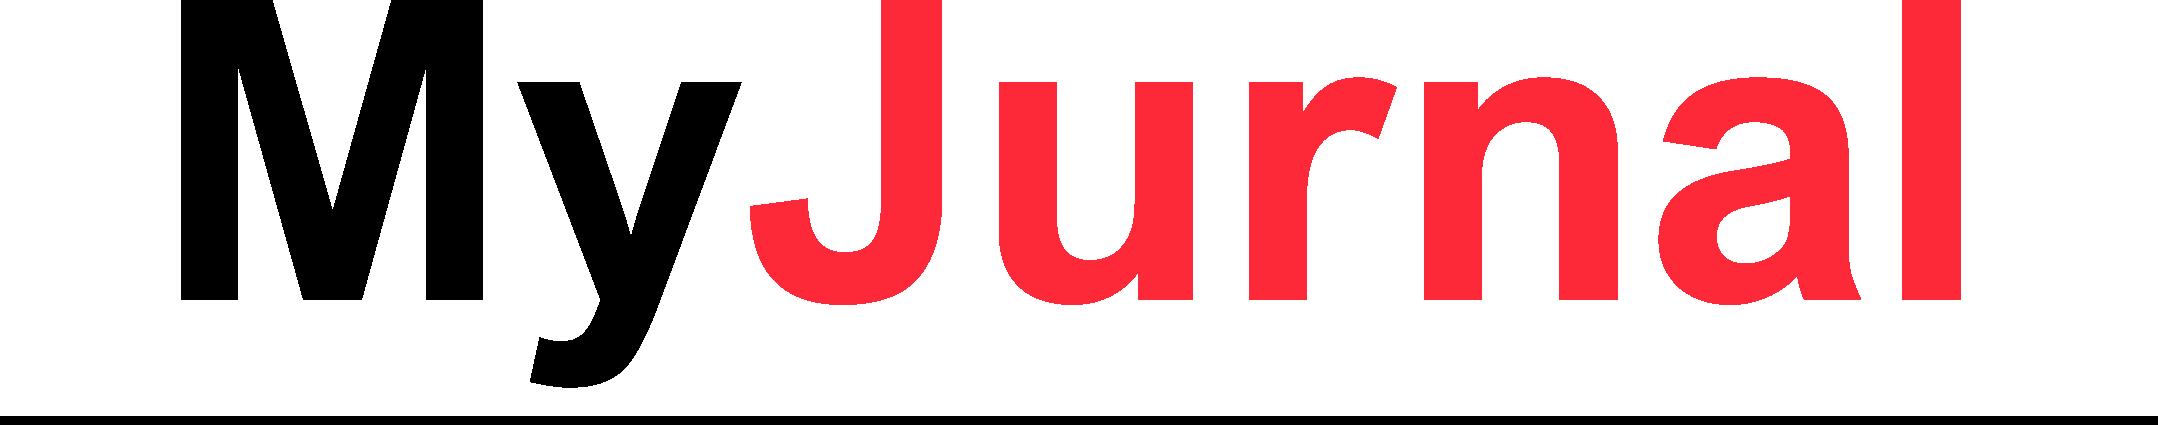 MyJurnal